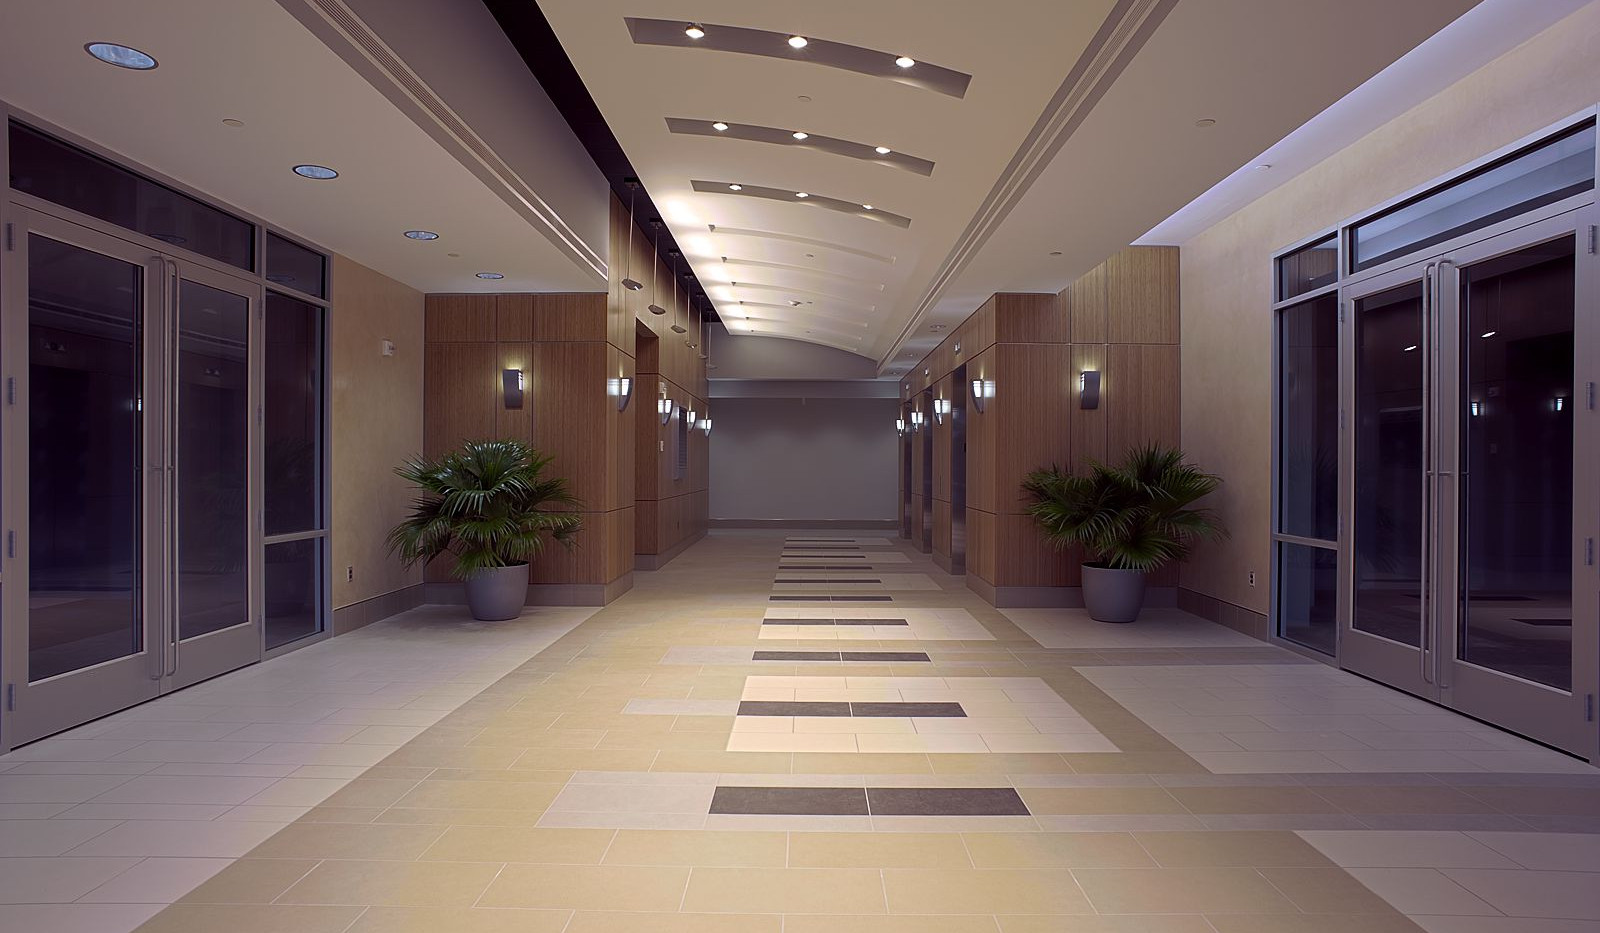 308 Nat'l. Business Parkway - Interior